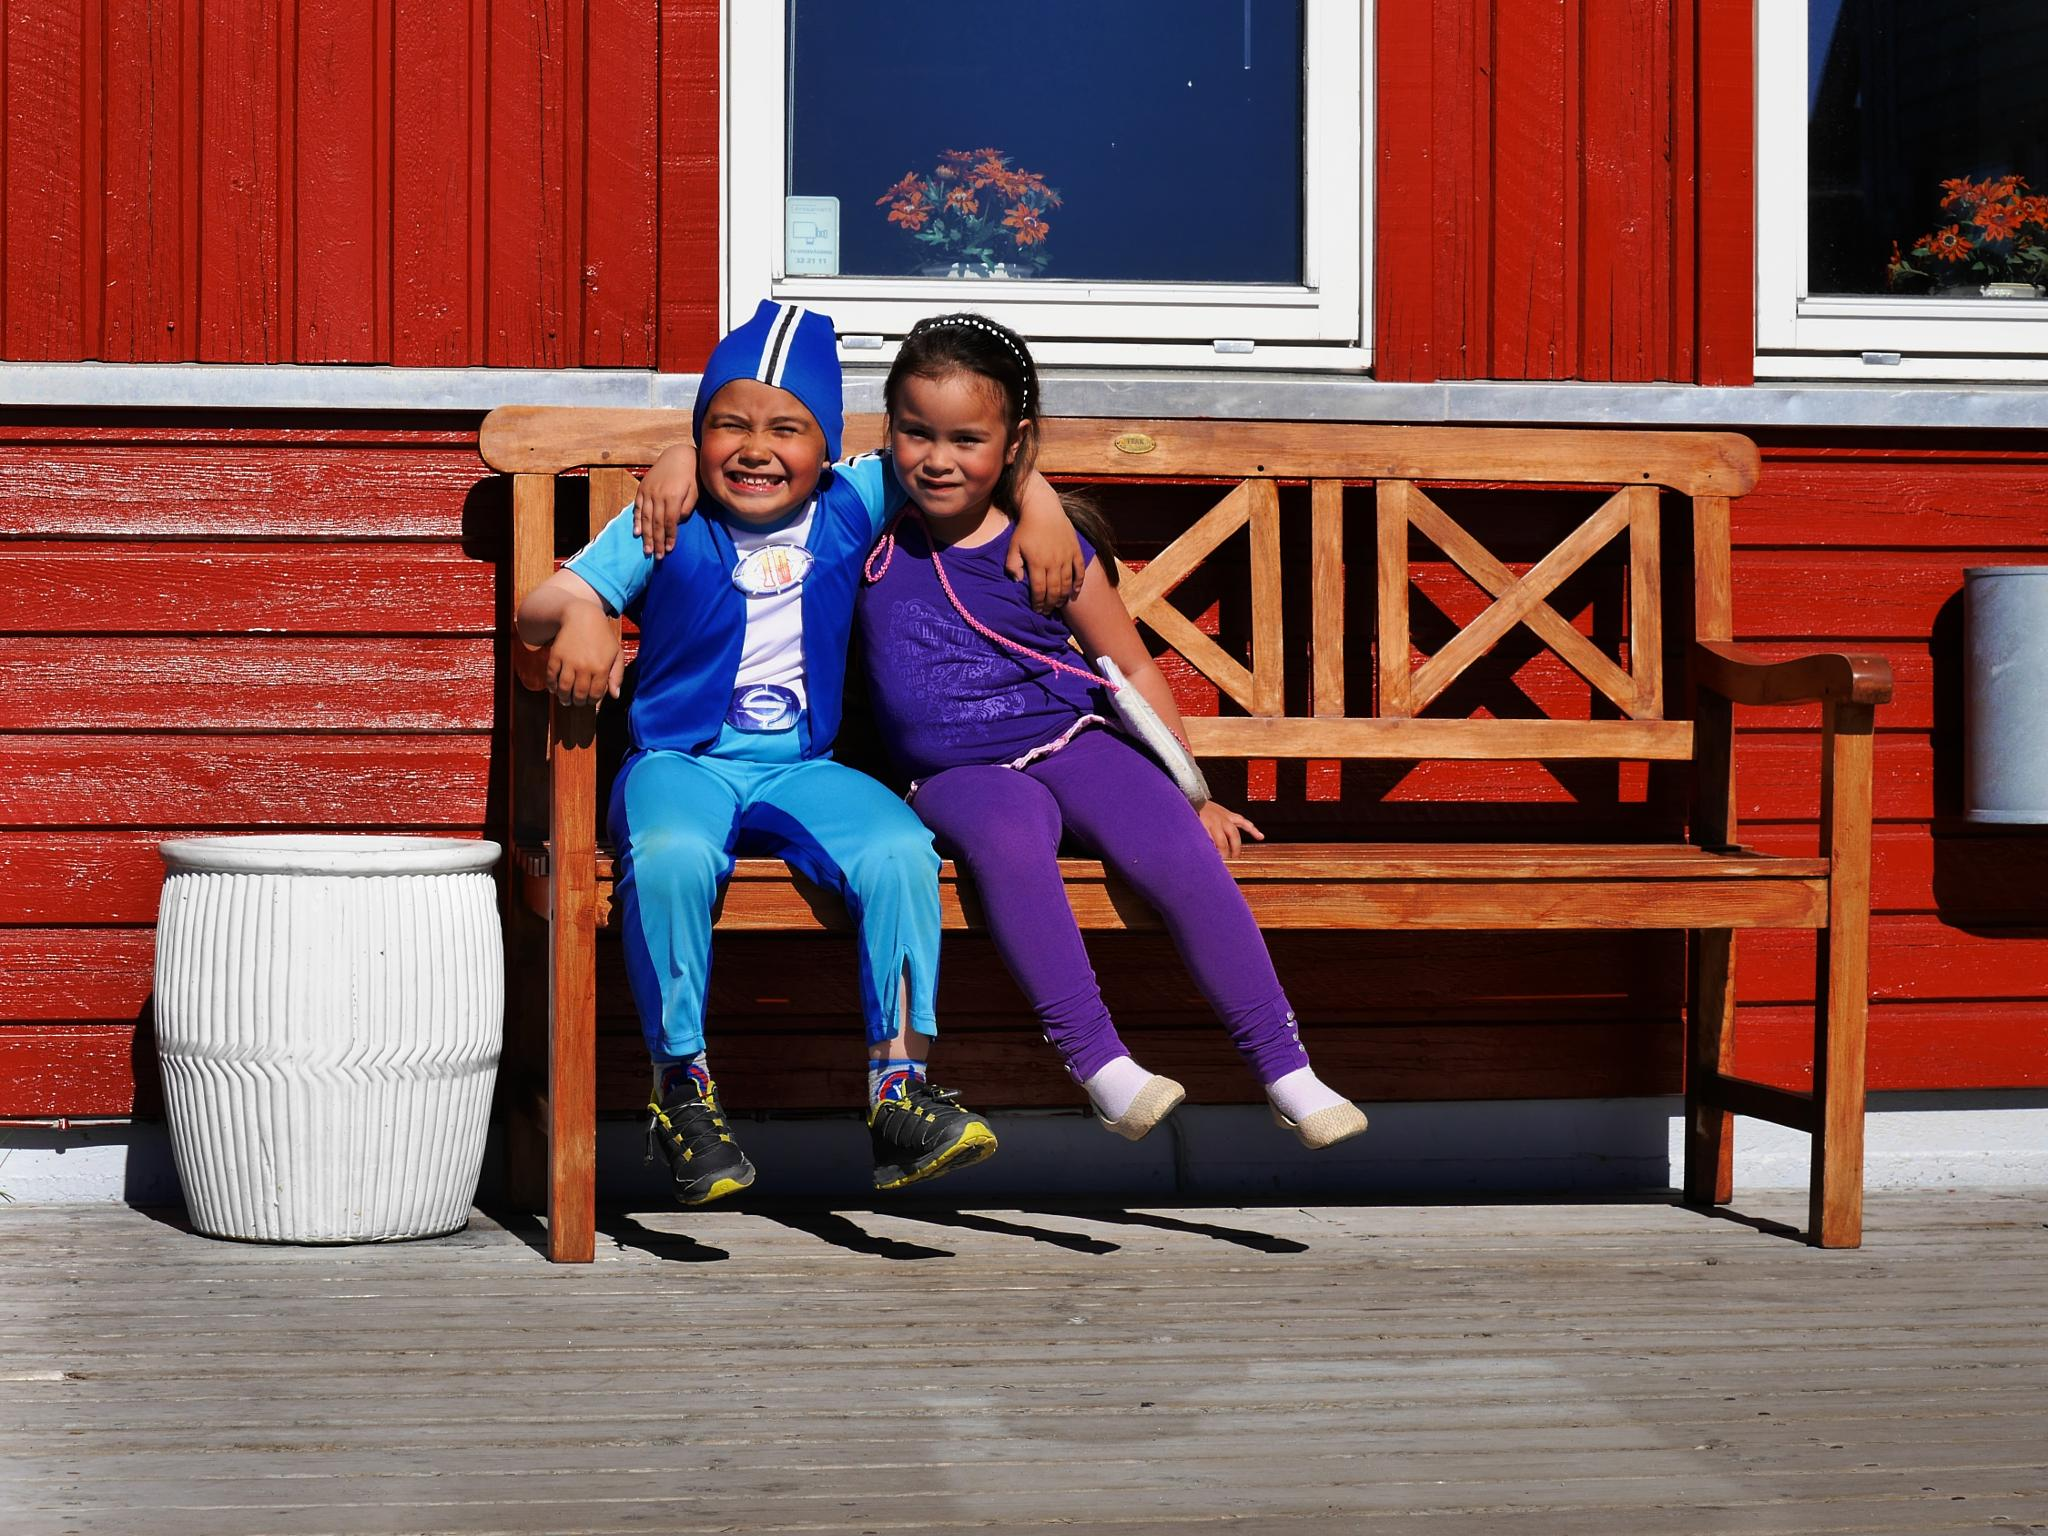 saturday qualitytime with children by Tom Augo Lynge